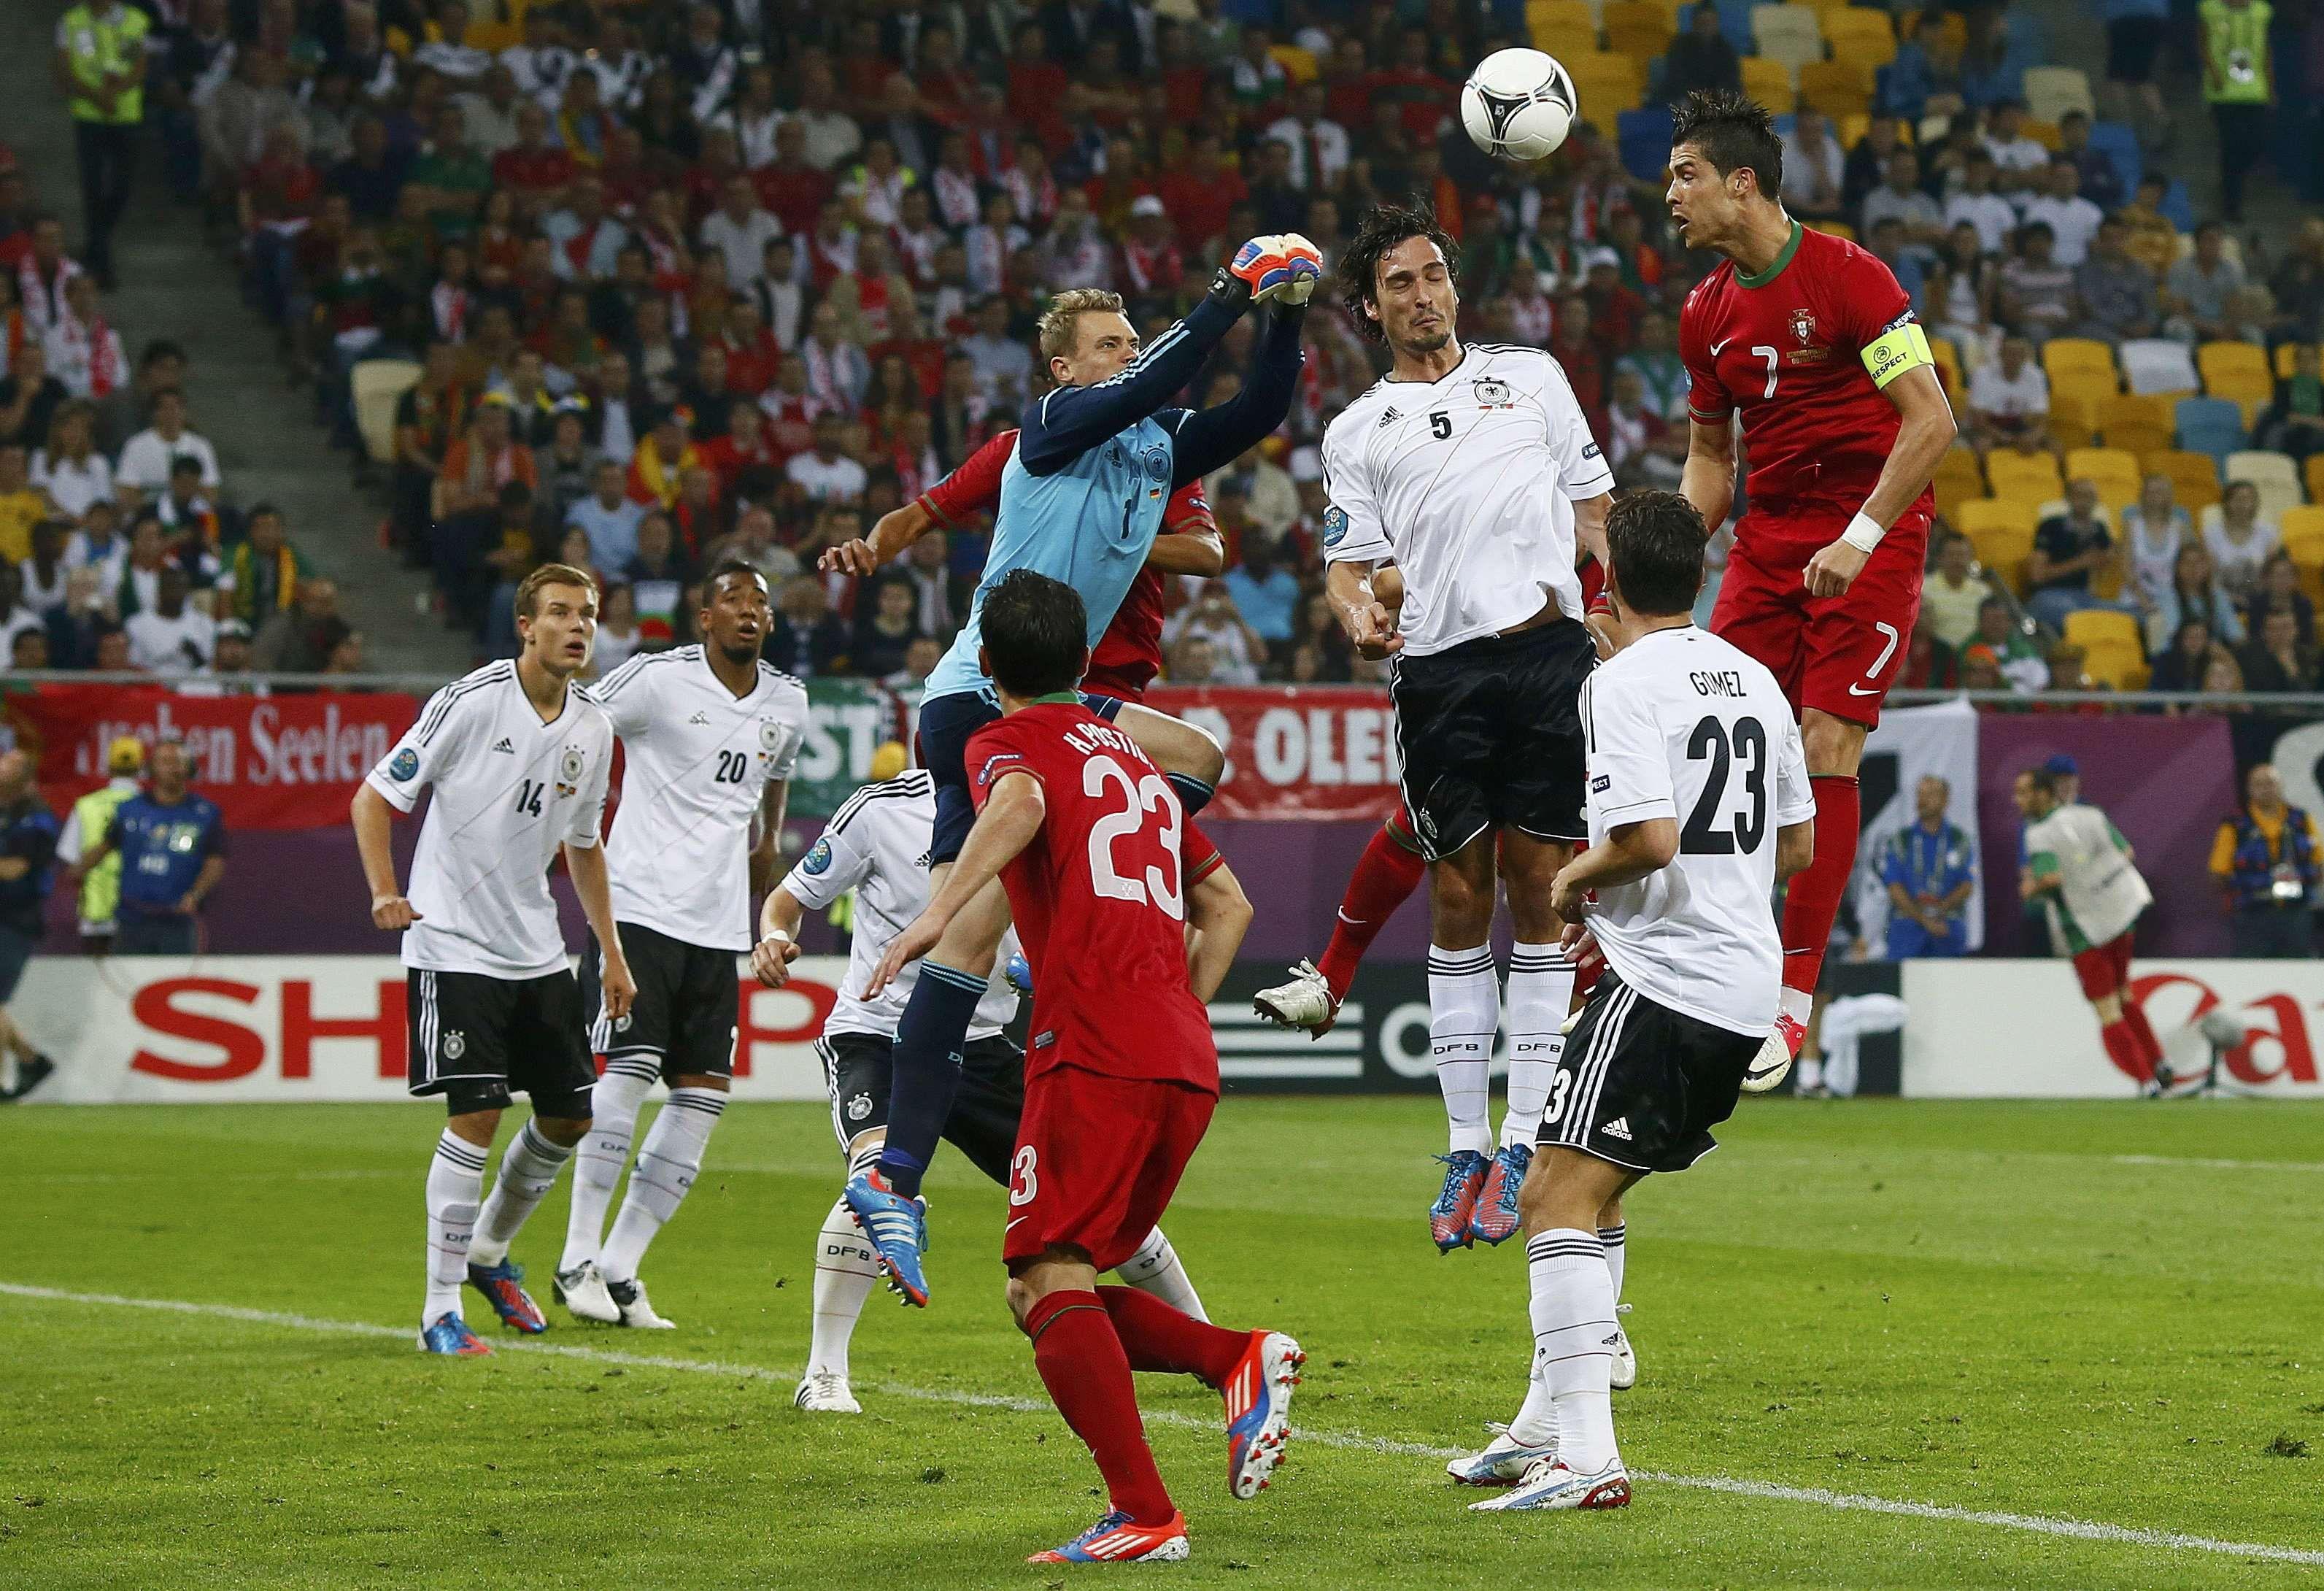 Germany vs Portugal // Manuel Neuer // Euro 2012 | Cristiano ronaldo, Cristiano ronaldo 2014, Euro 2012